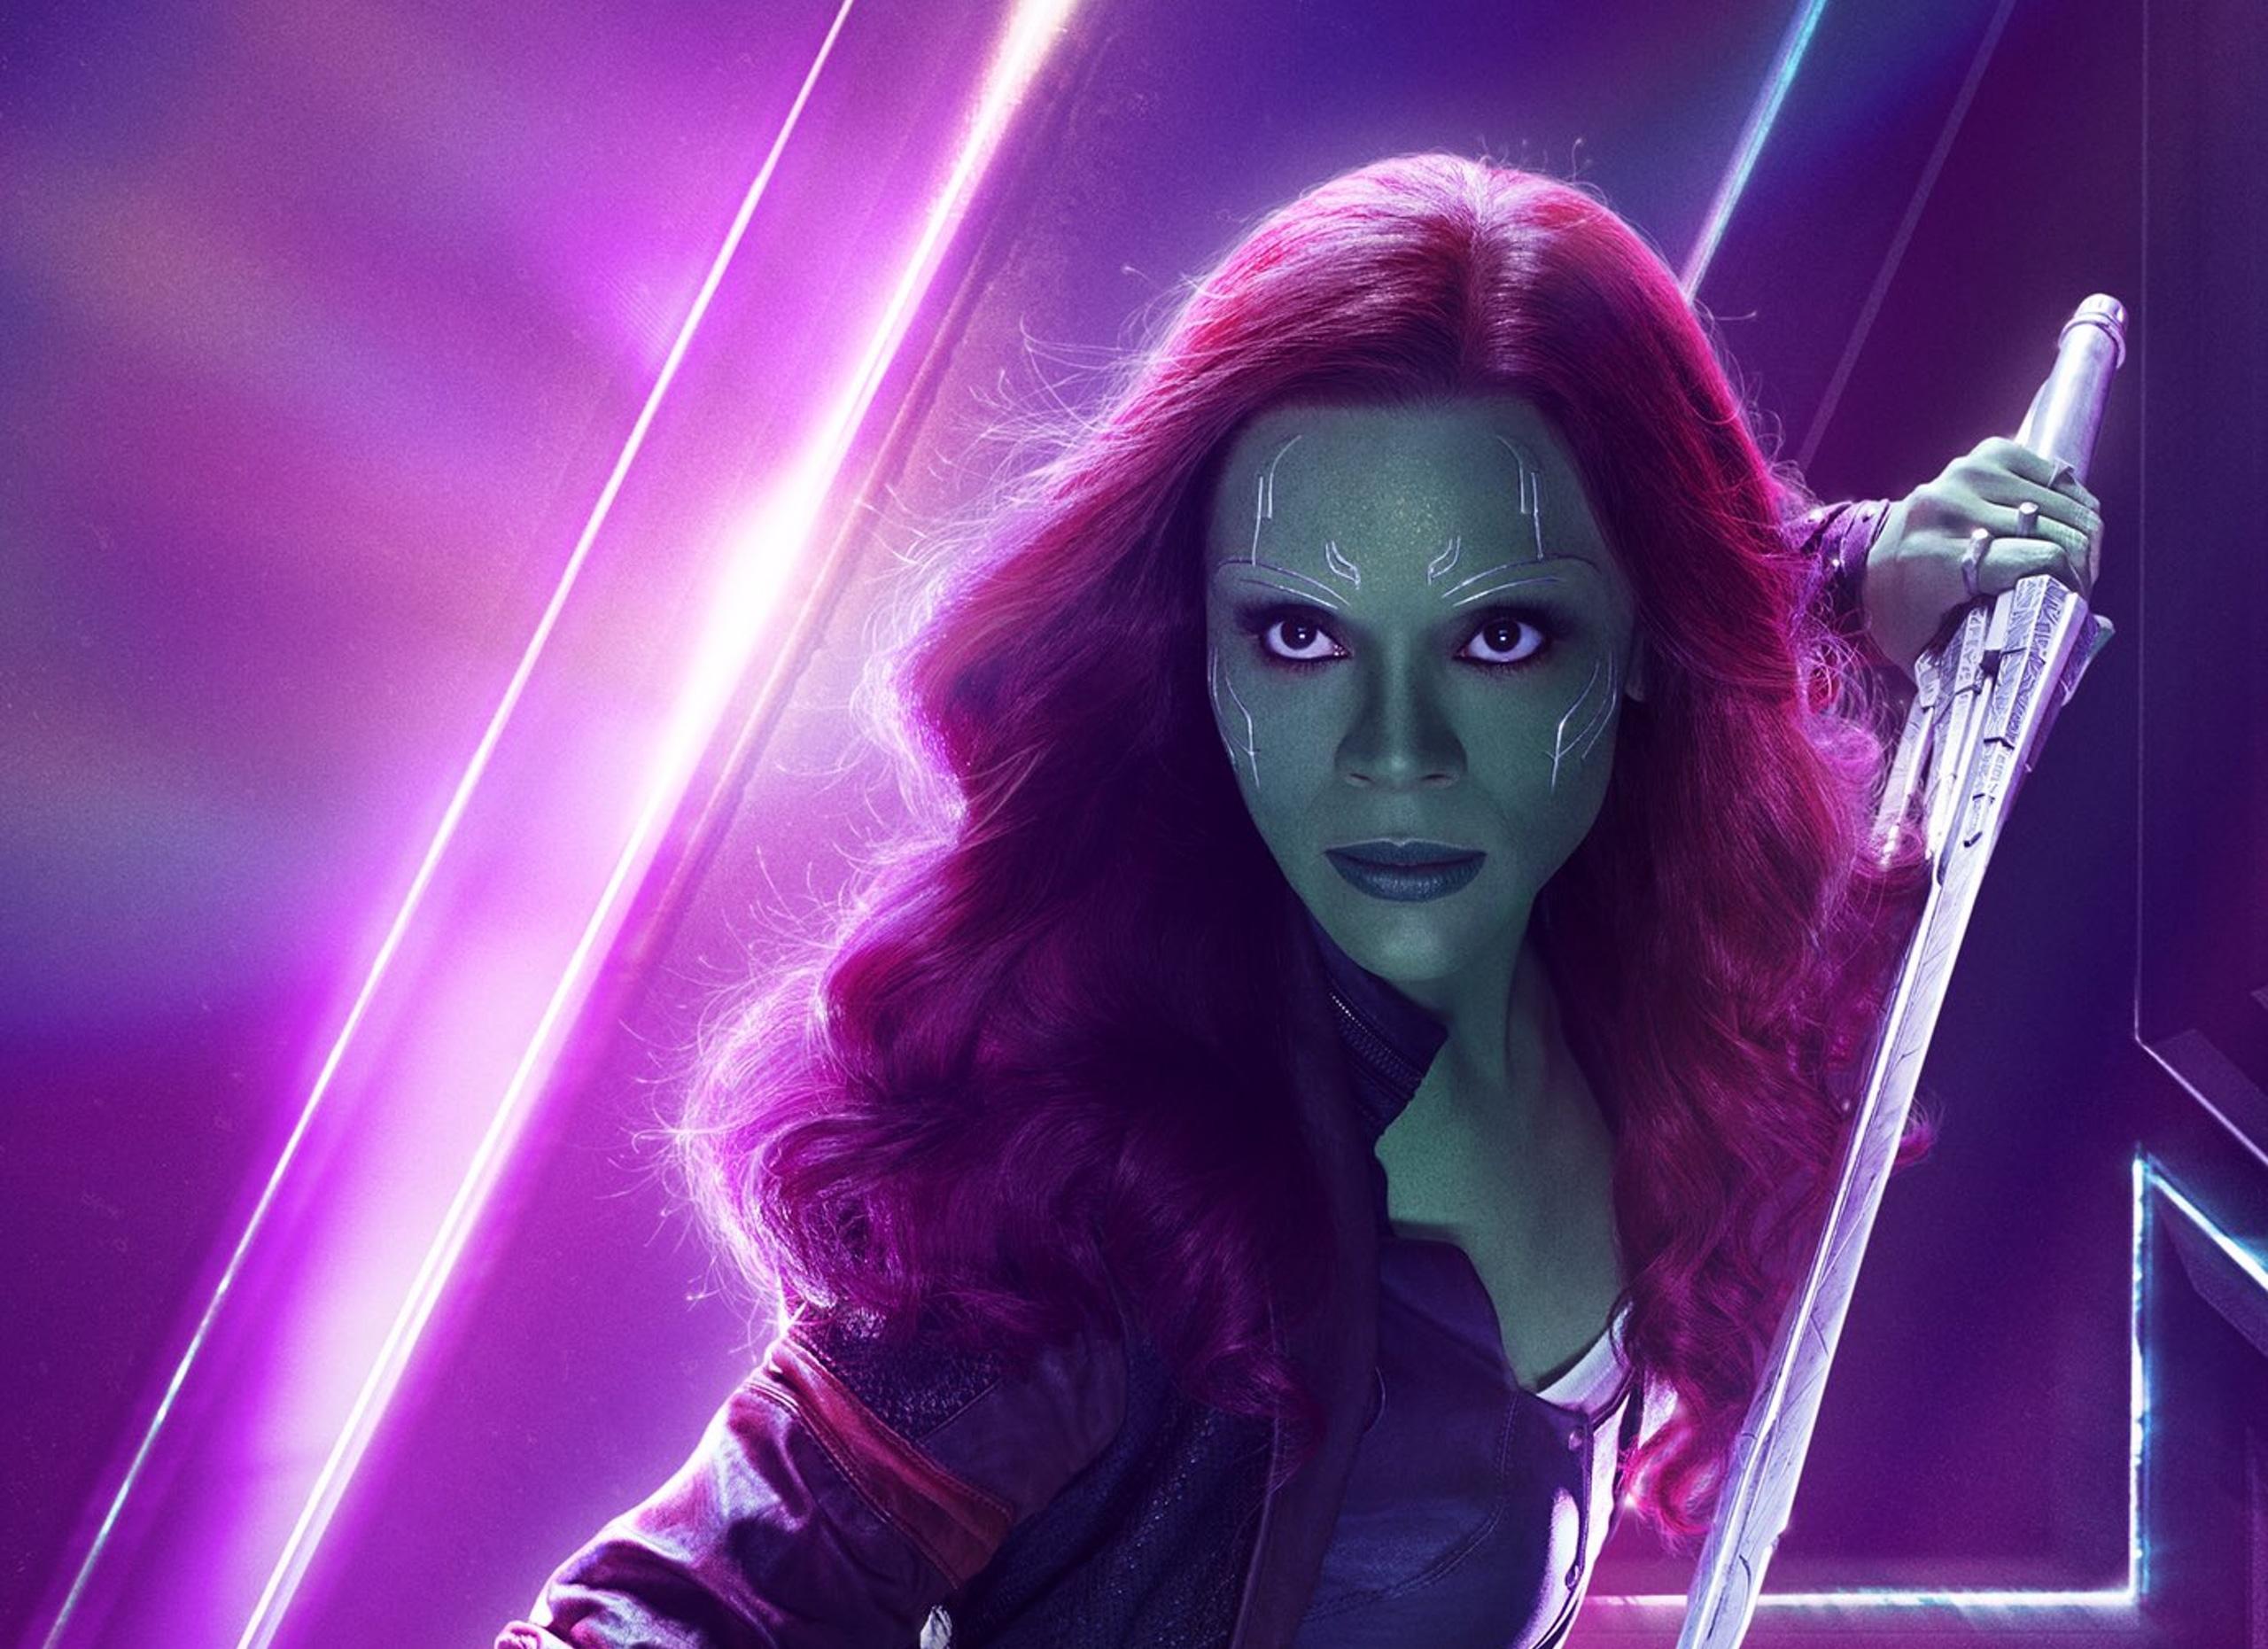 Shuri In Avengers Infinity War New Poster Hd Movies 4k: Gamora In Avengers Infinity War New Poster, HD Movies, 4k